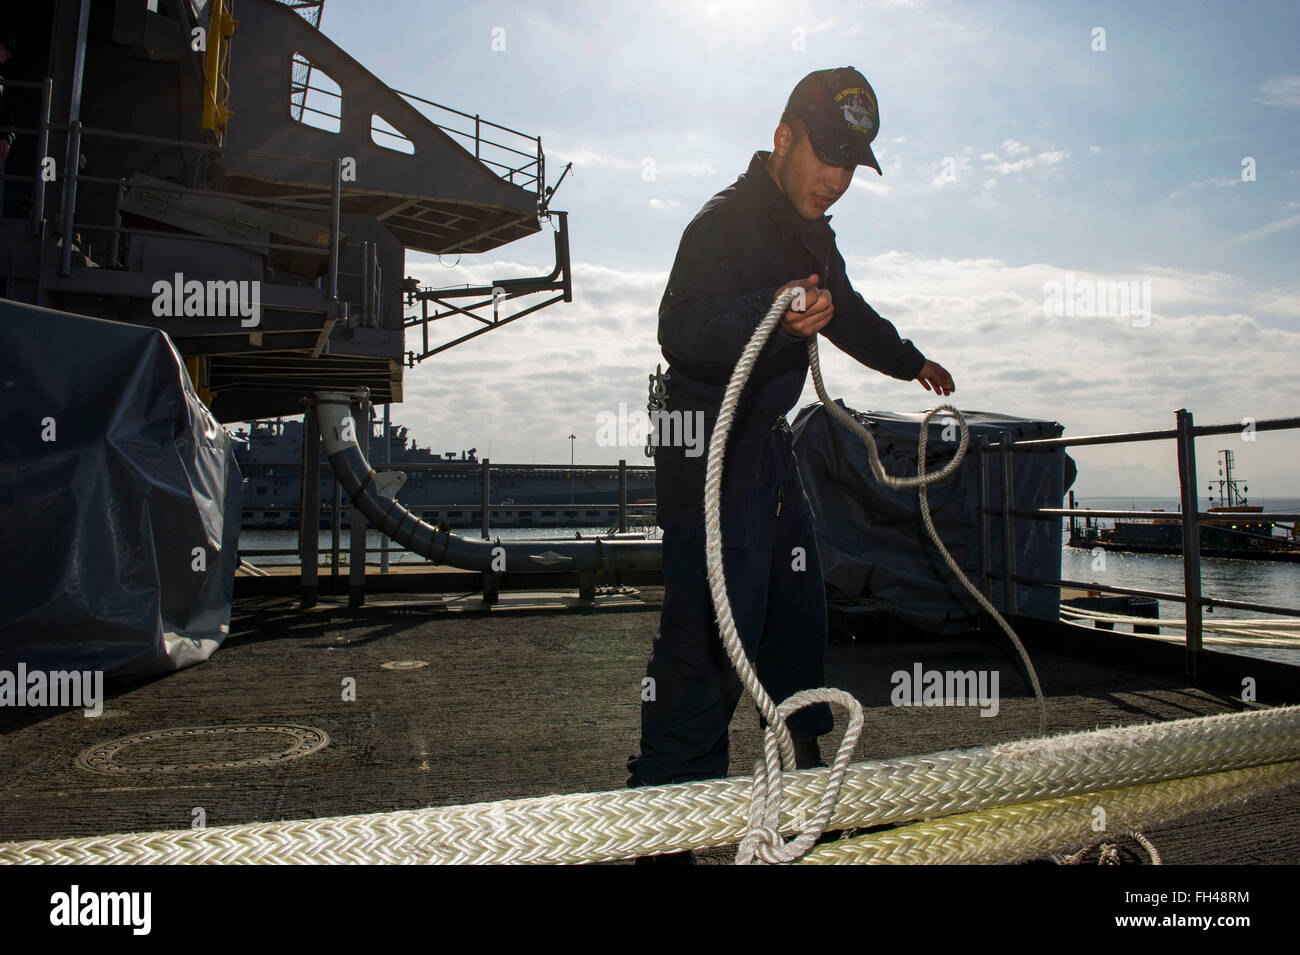 NORFOLK, Va. (Feb. 22, 2016) - Seaman Jason Santamaria fakes out a messenger line on the fantail of the aircraft - Stock Image